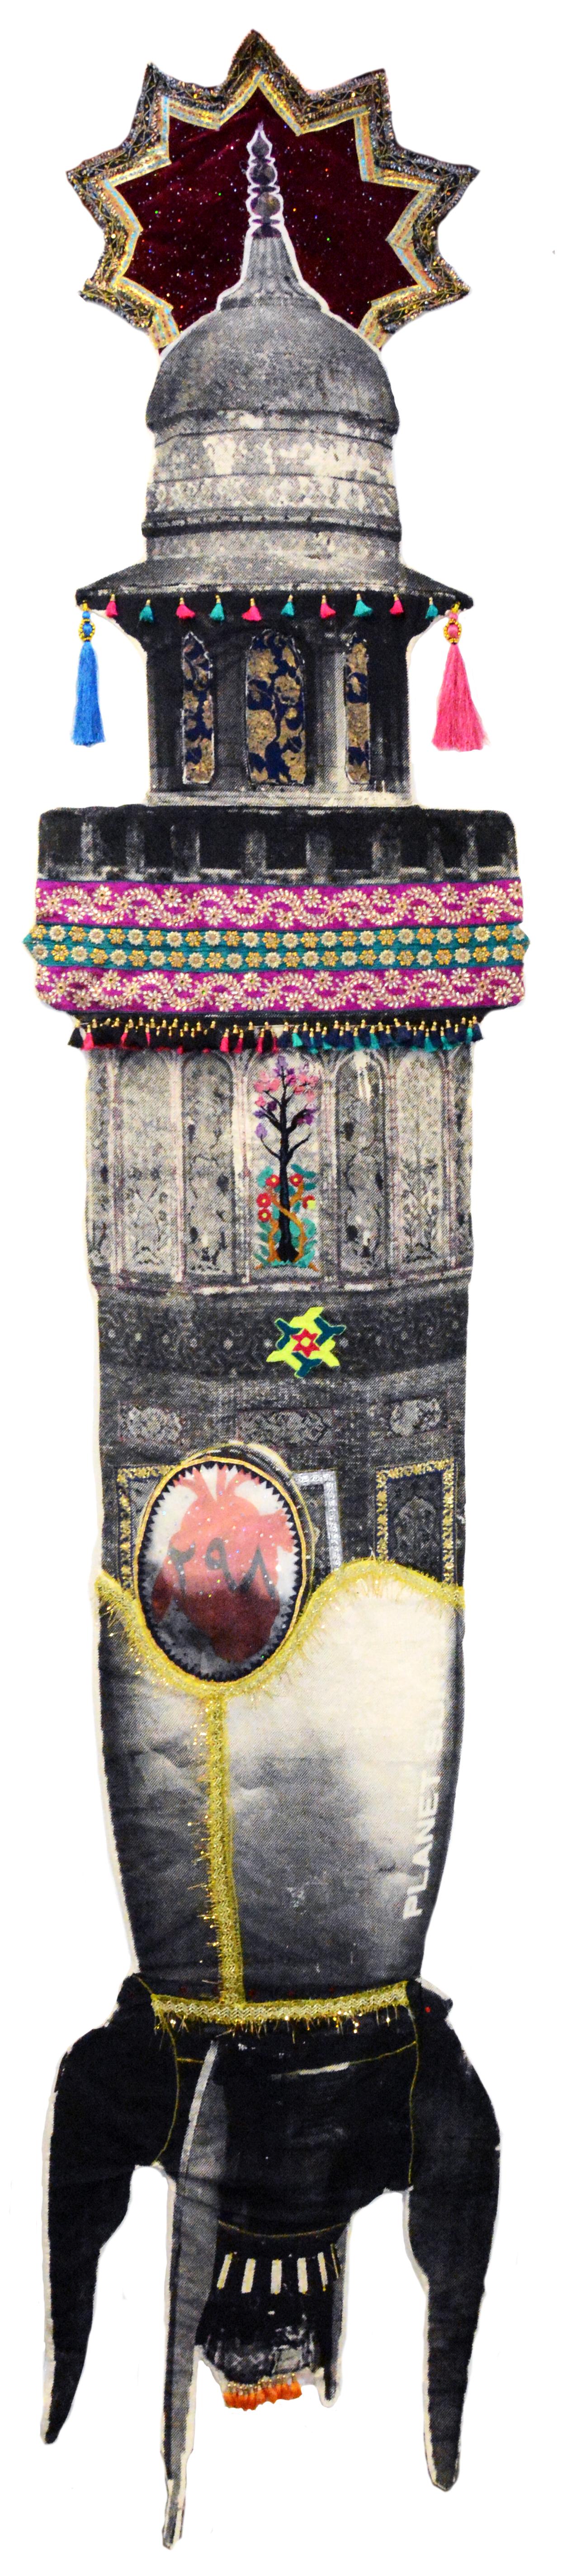 Grace 298 رحمن ۲۹۸ by Zulfikar Ali Bhutto. Screen print on muslin, chiffon and raw silk, inkjet print on silk, various trimming, embroidery. 2020, 148 x 28 in.